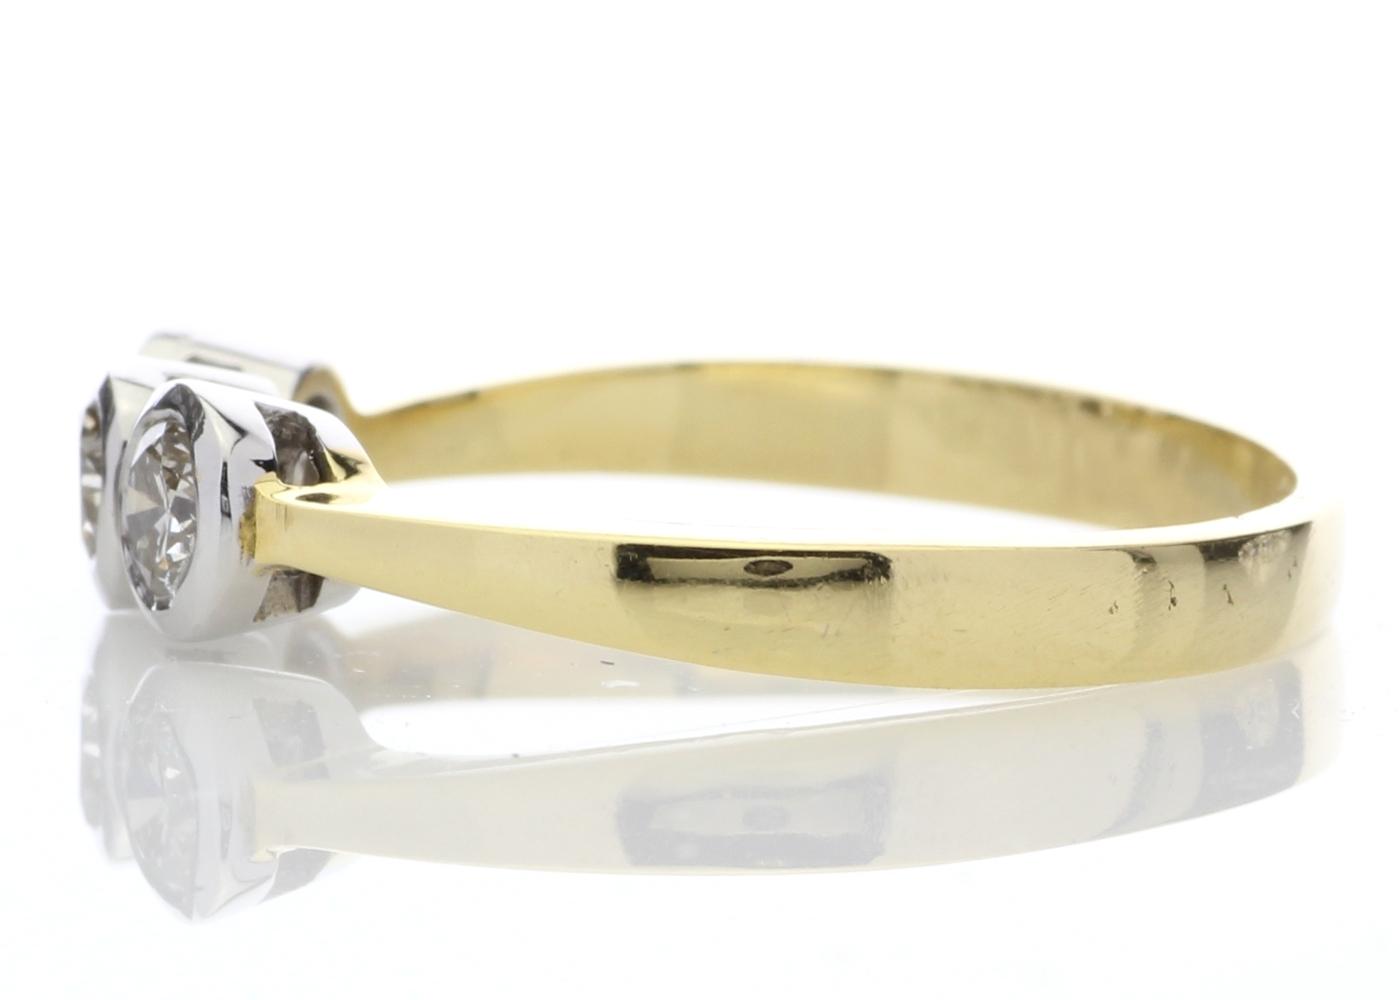 18ct Three Stone Claw Set Diamond Ring 0.75 Carats - Image 3 of 4